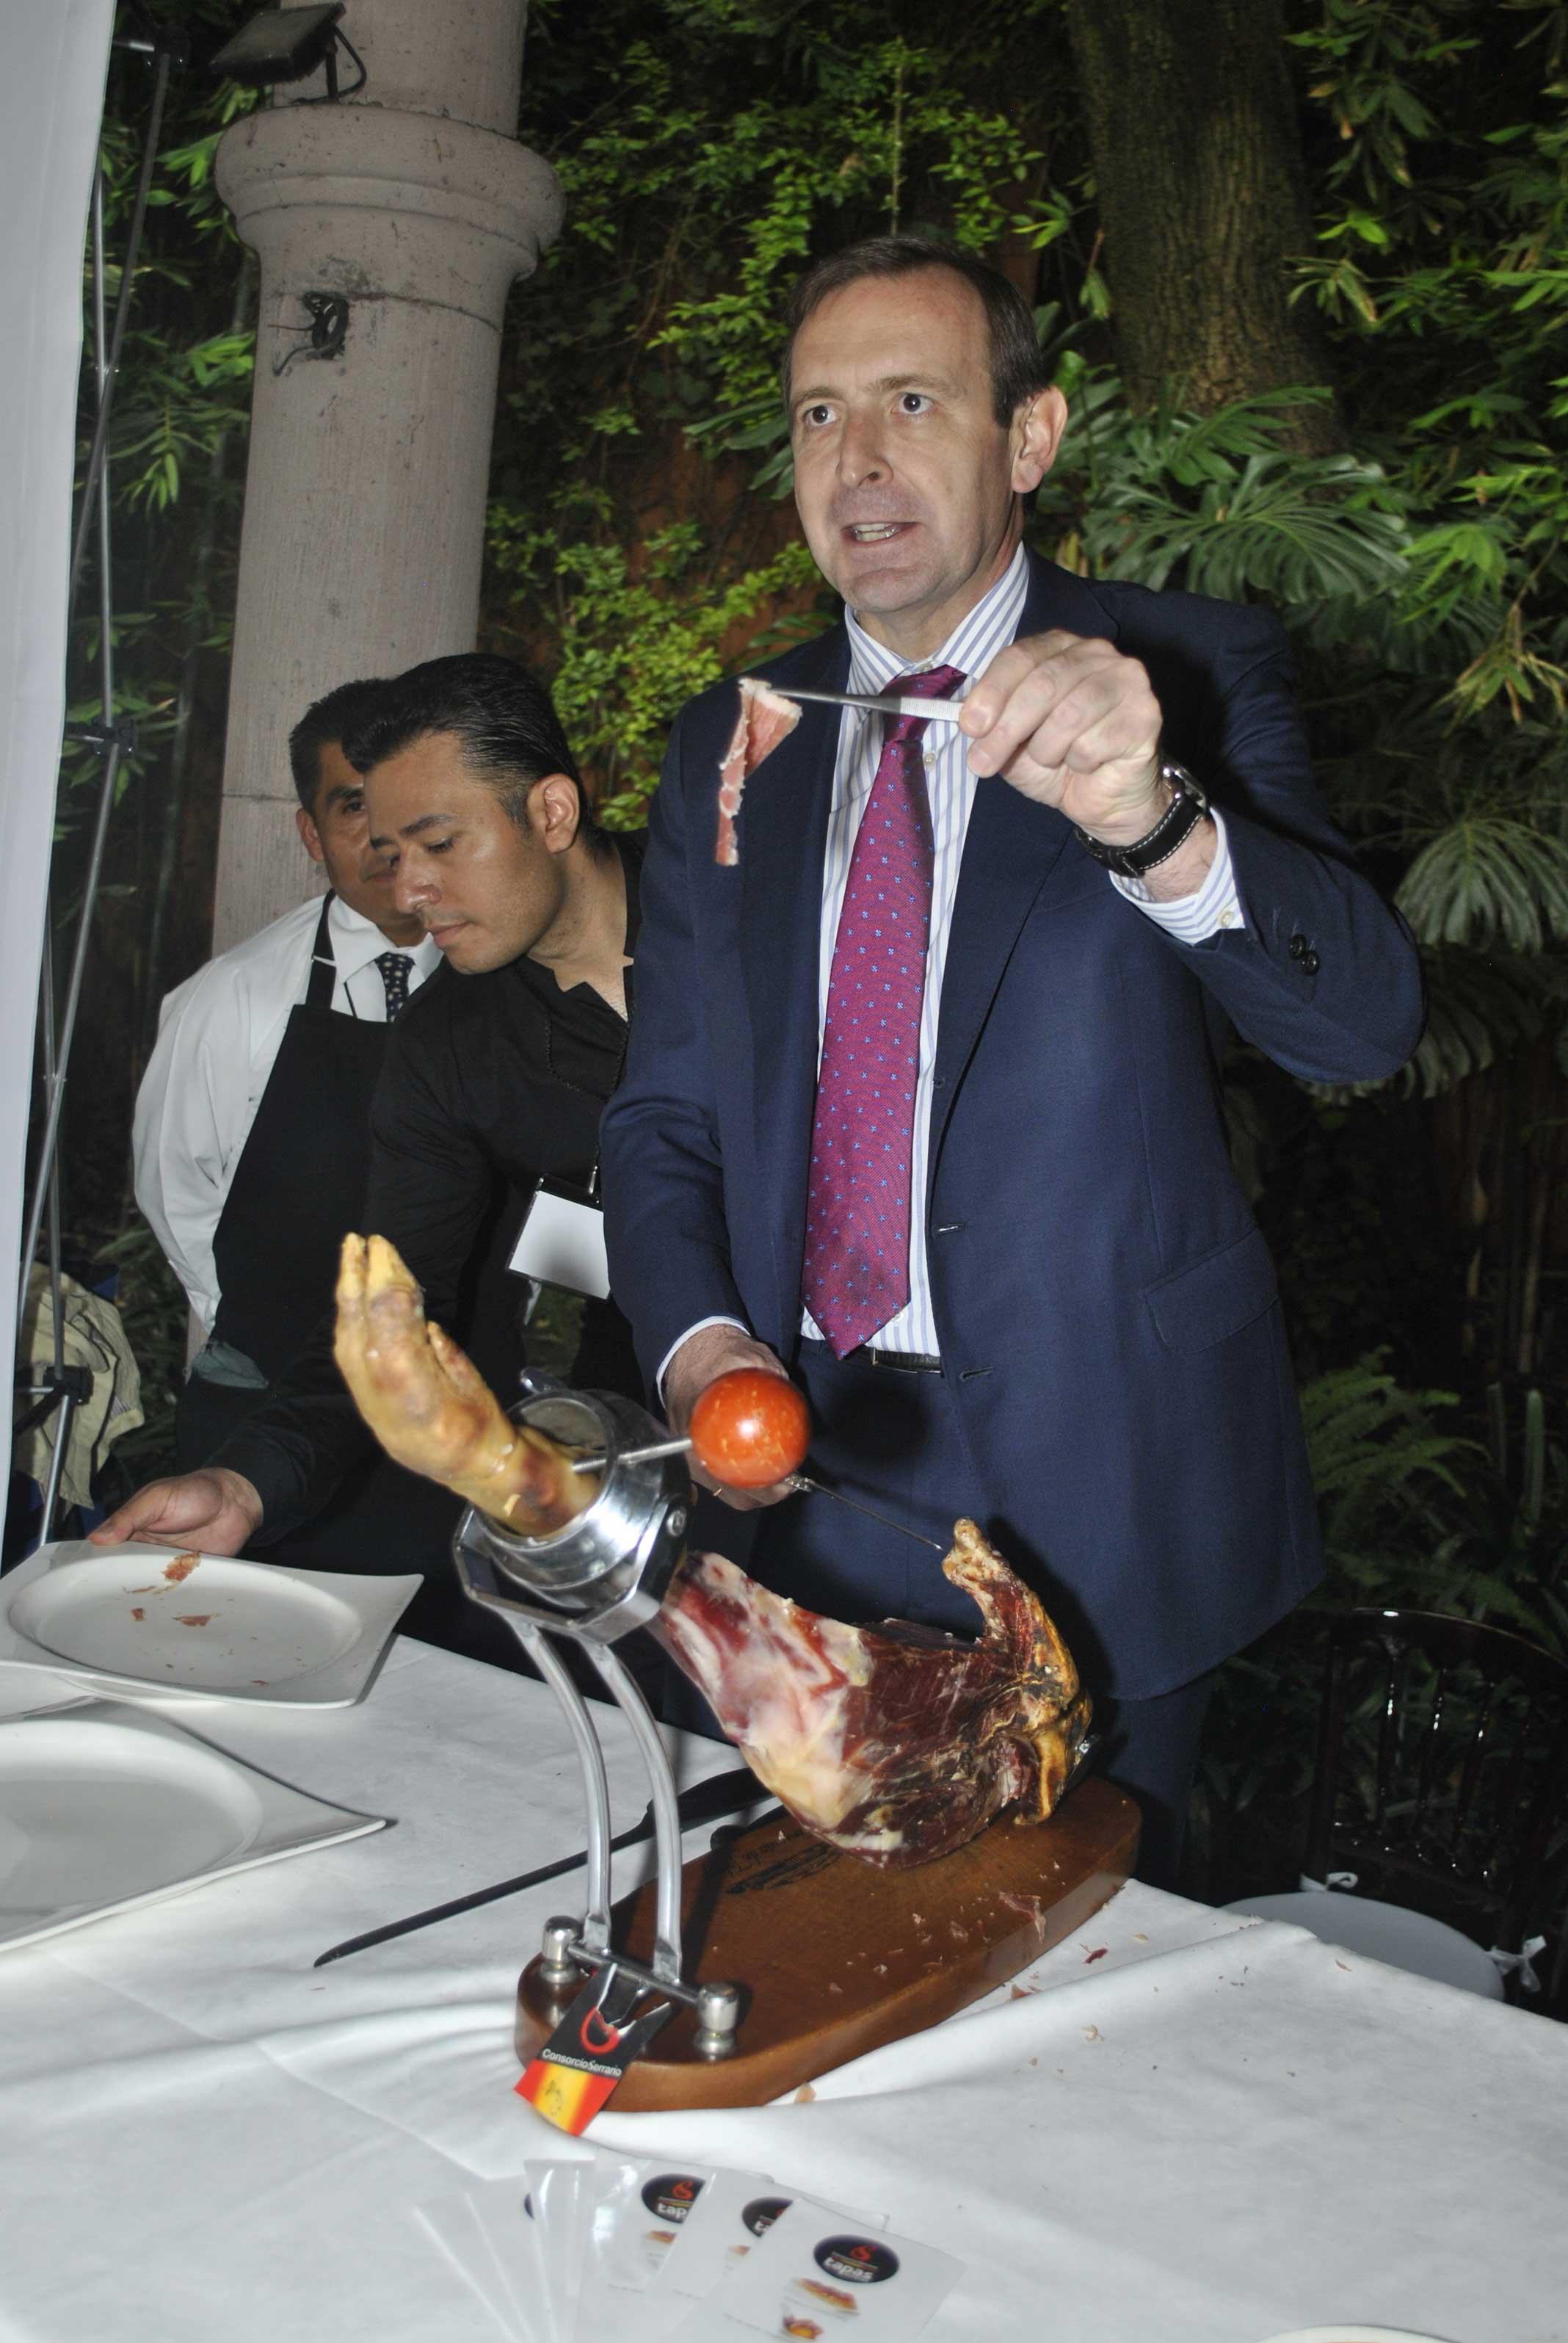 Luis Fernández-Cid, embajador de España, hizo ver sus dotes como cortador de jamón serrano